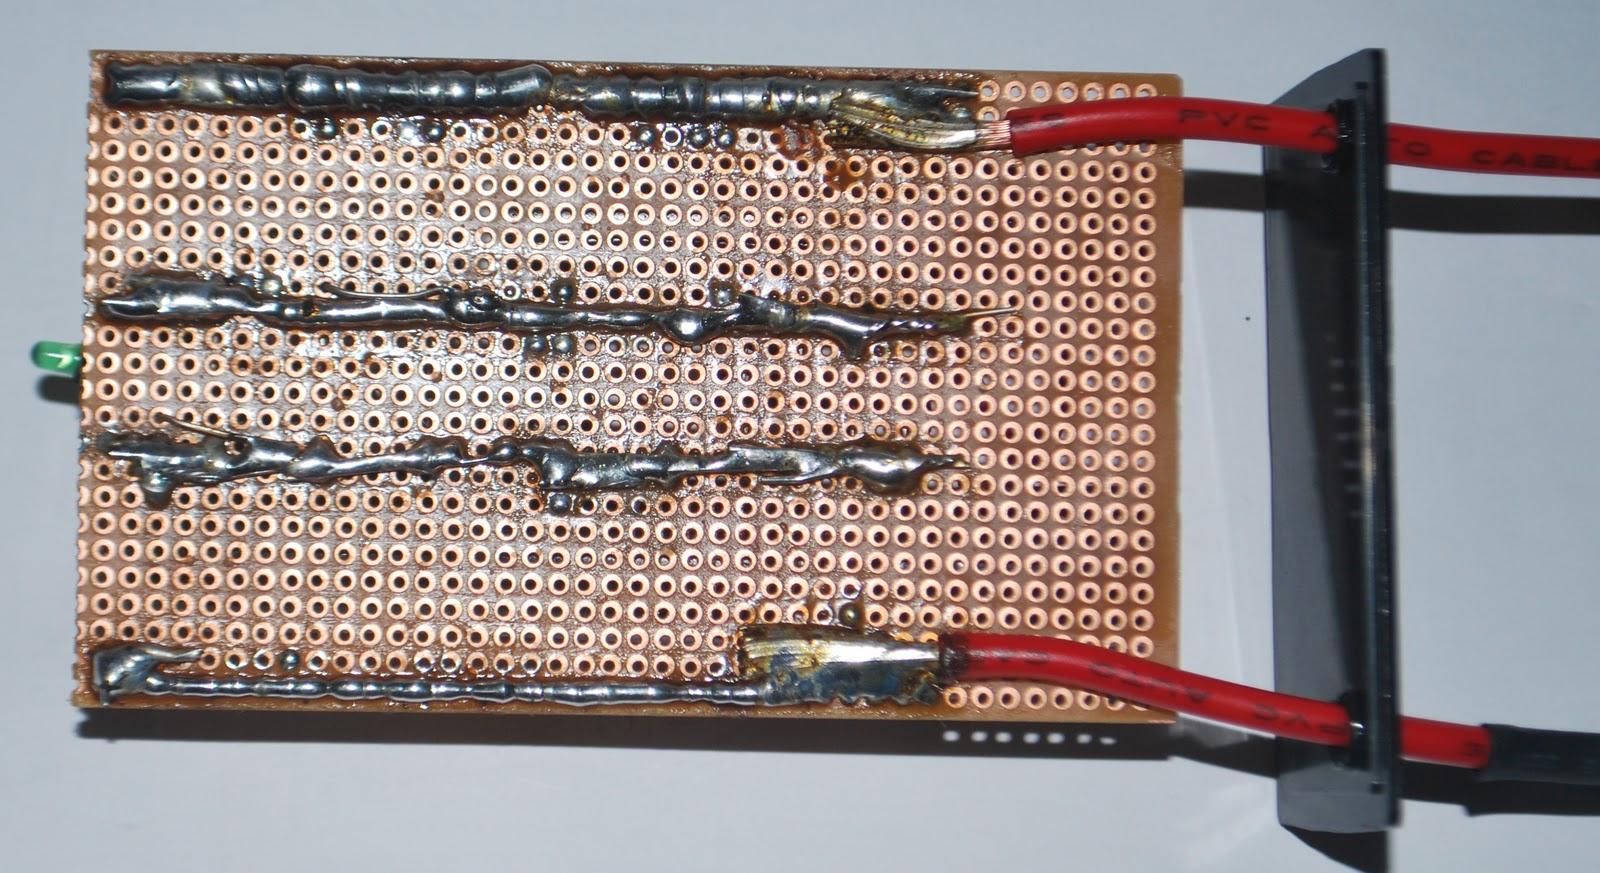 Diy Fix On Your Own 33640uf Car Voltage Stabilizer Plus Fake Pivot Circuit Diagram